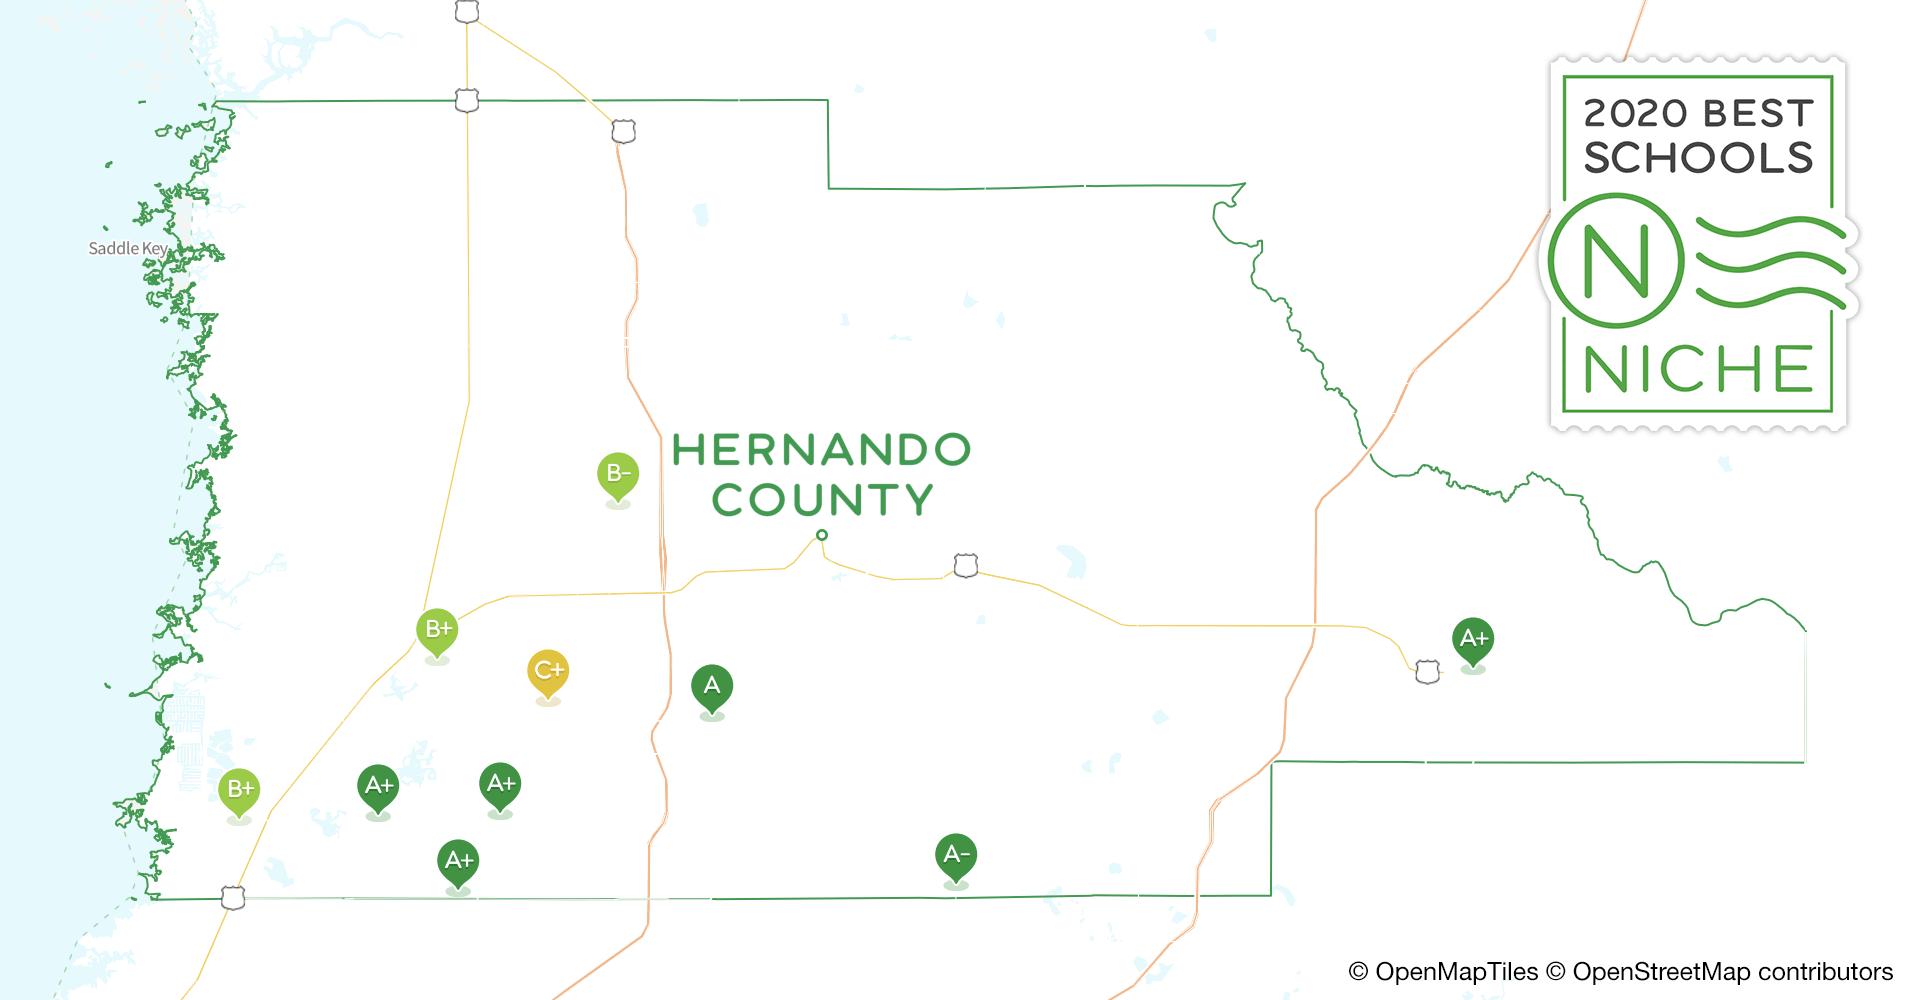 Hernando County Events 2020.2020 Best High Schools In Hernando County Fl Niche